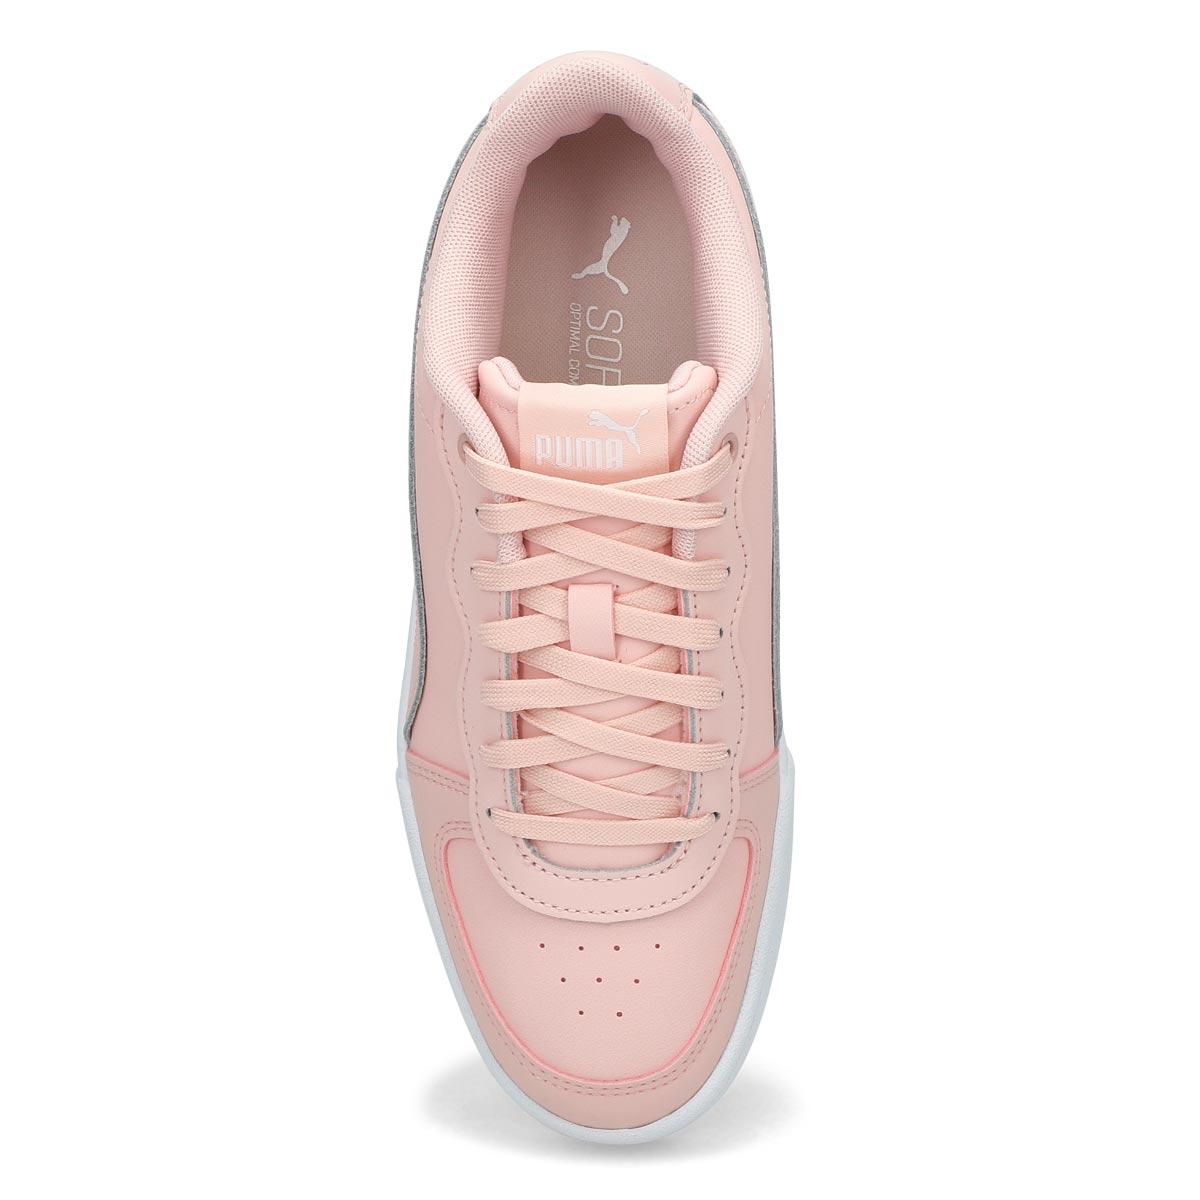 Women's Puma Skye Sneaker - Lotus /White